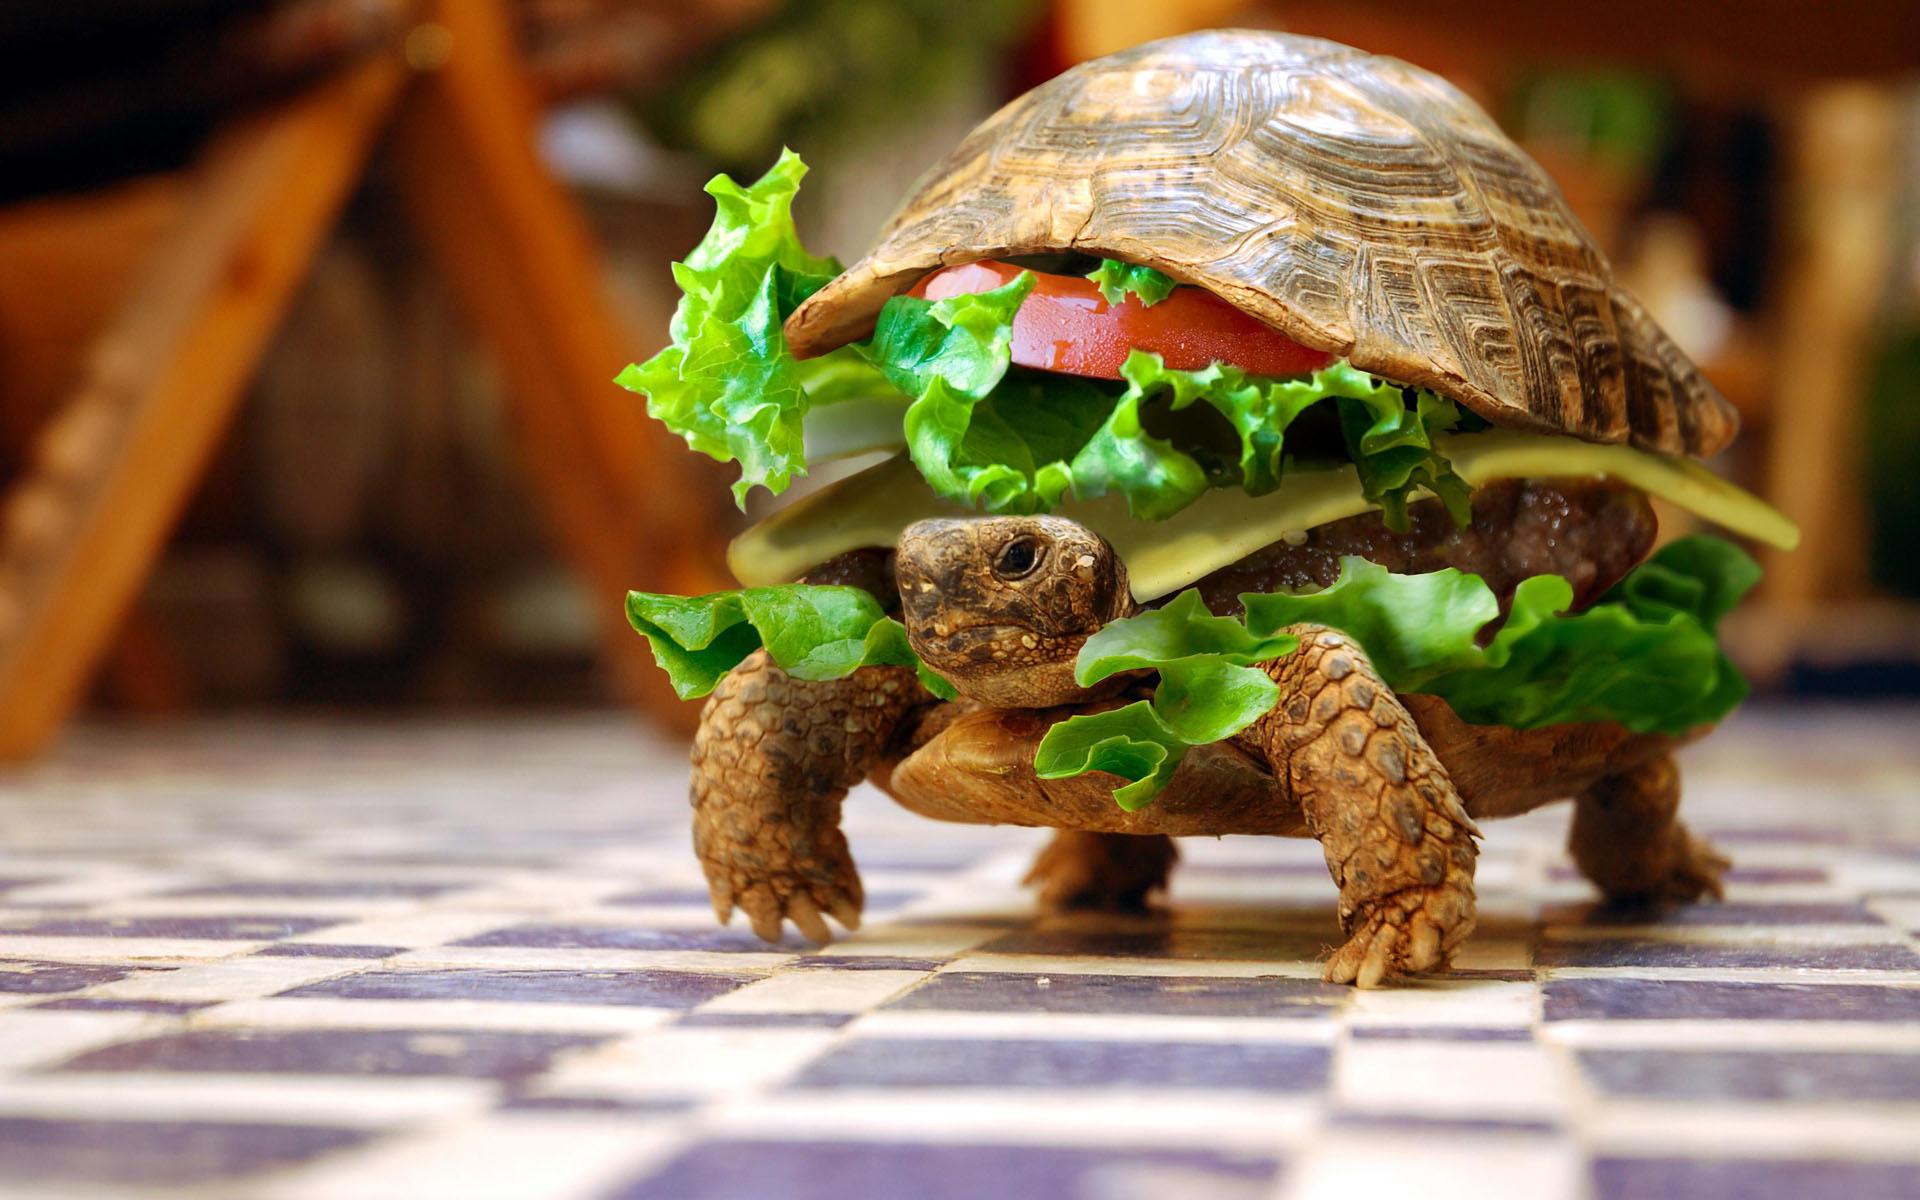 Cool Turtle Wallpaper